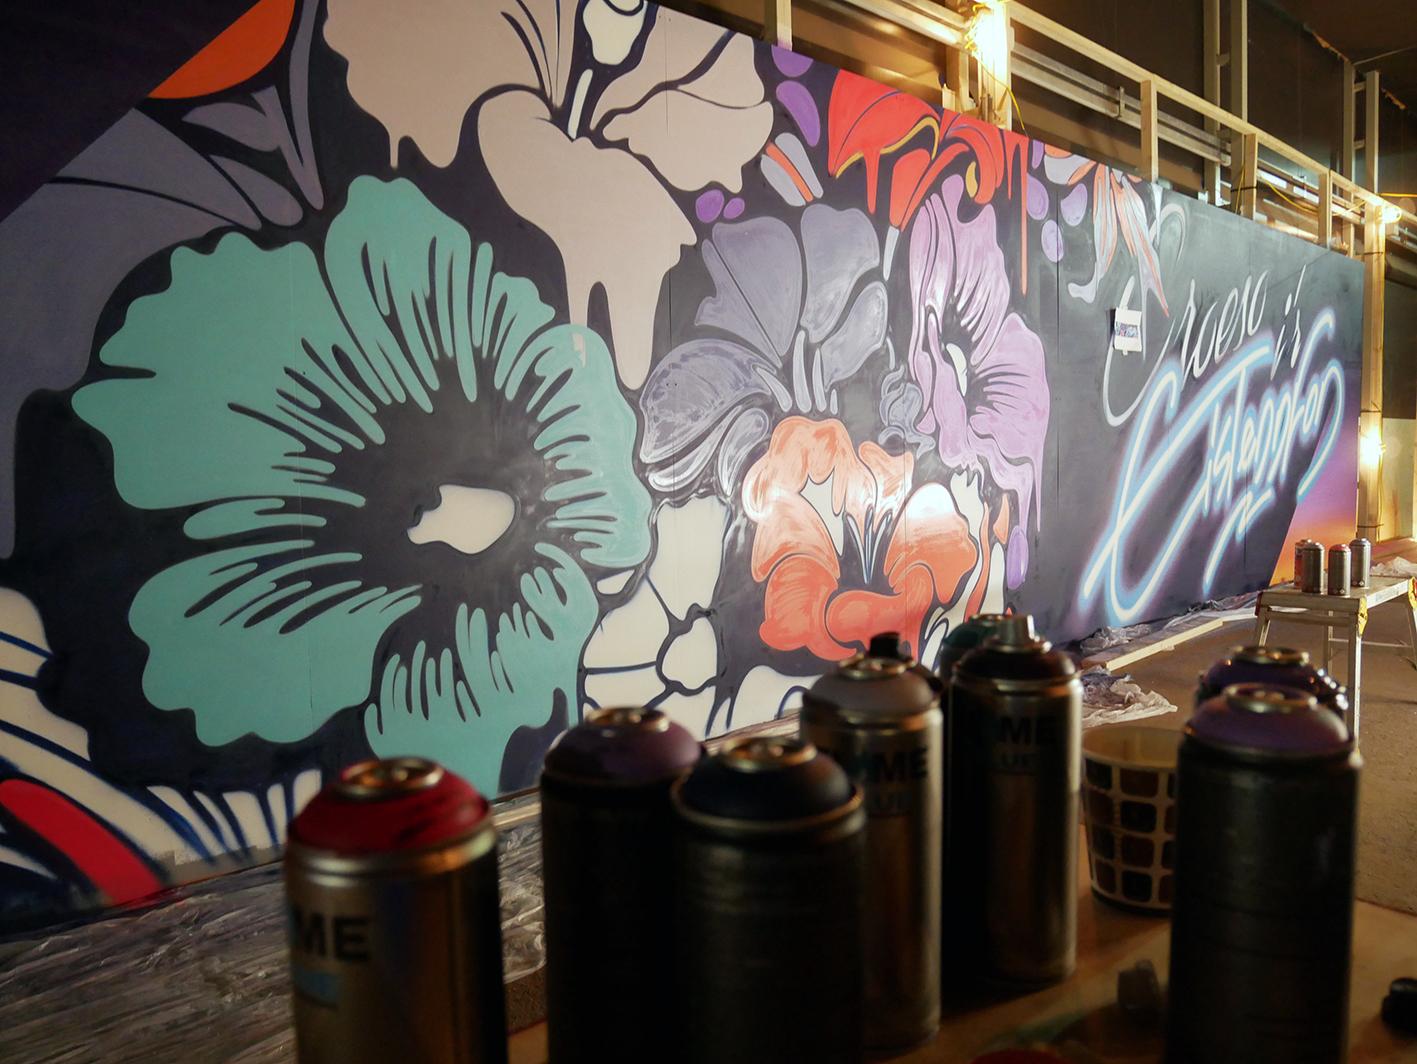 Nerone-street-art-Cardif-neone 11